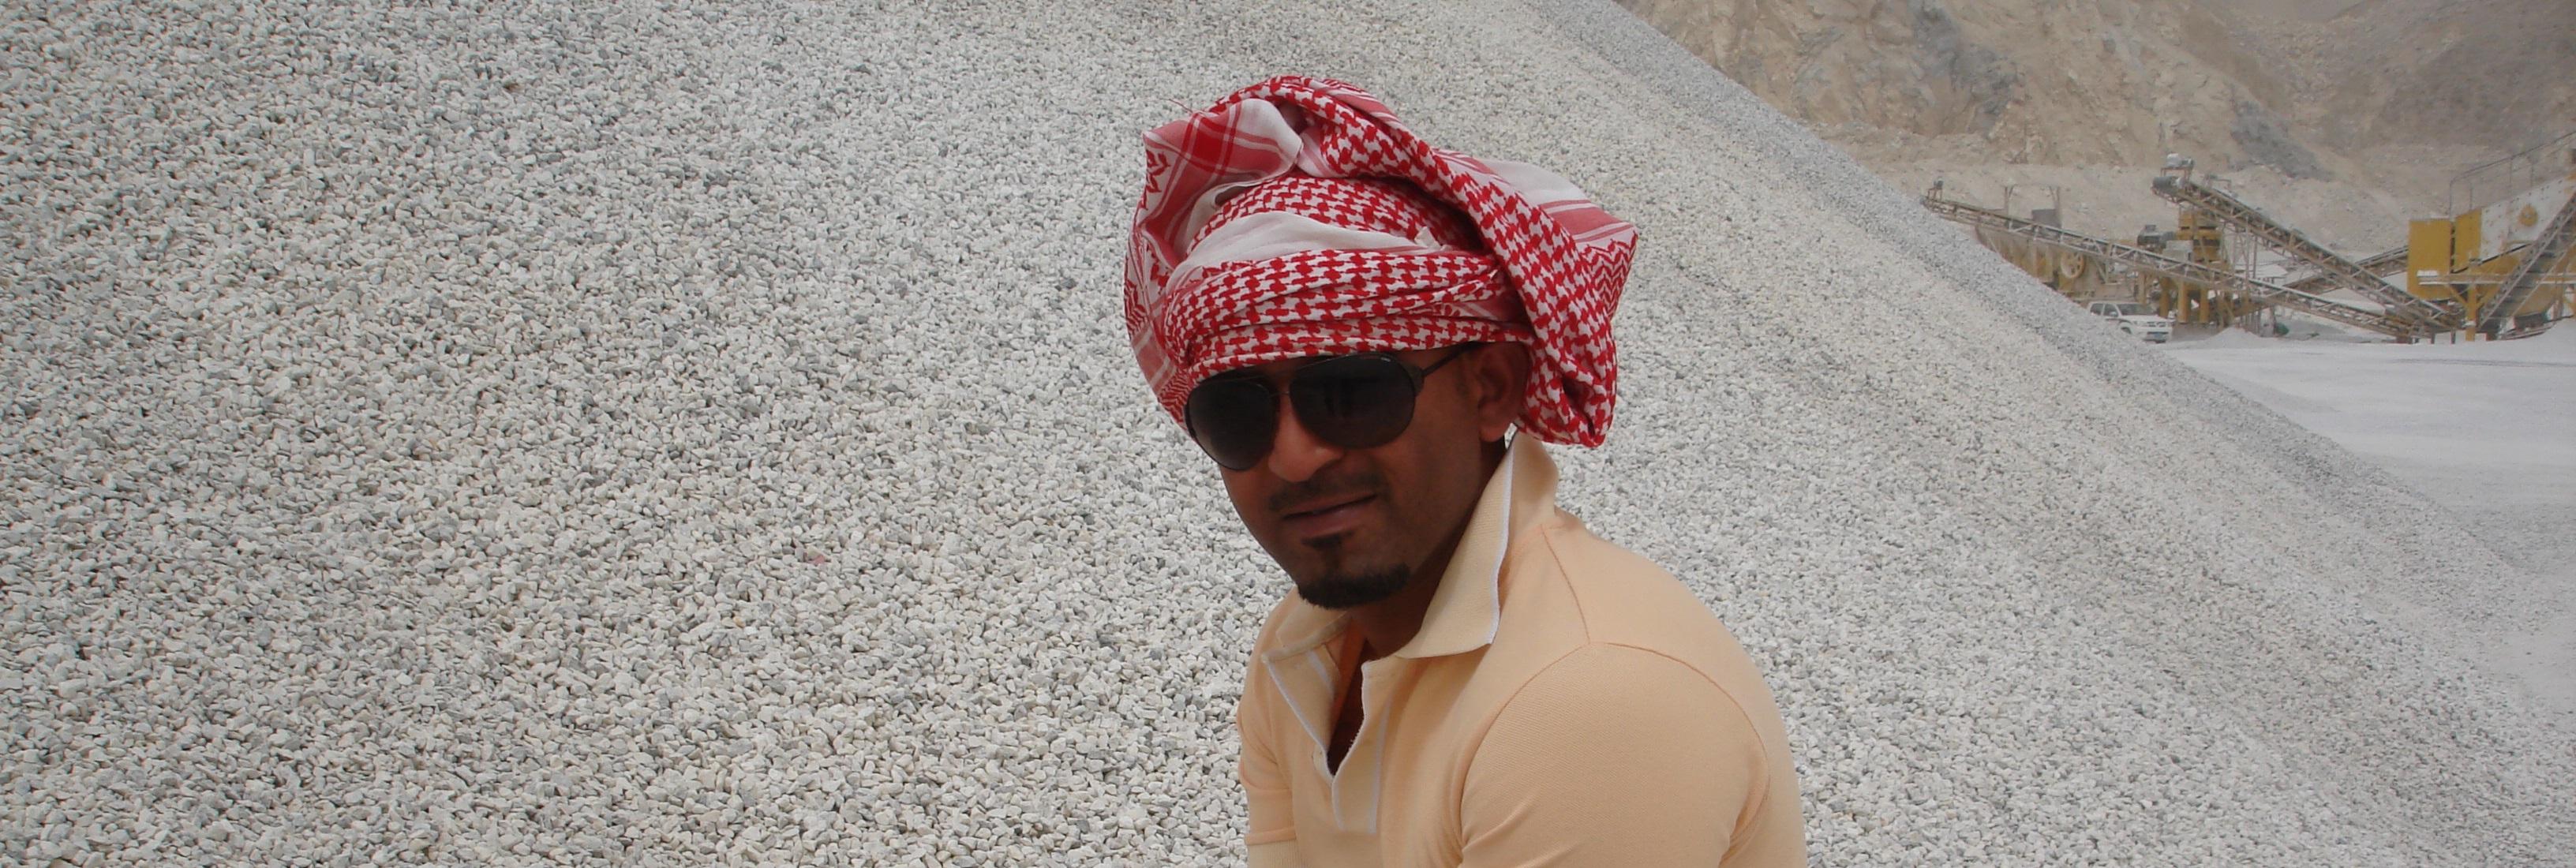 Limestone-mine-Jeddah-2009